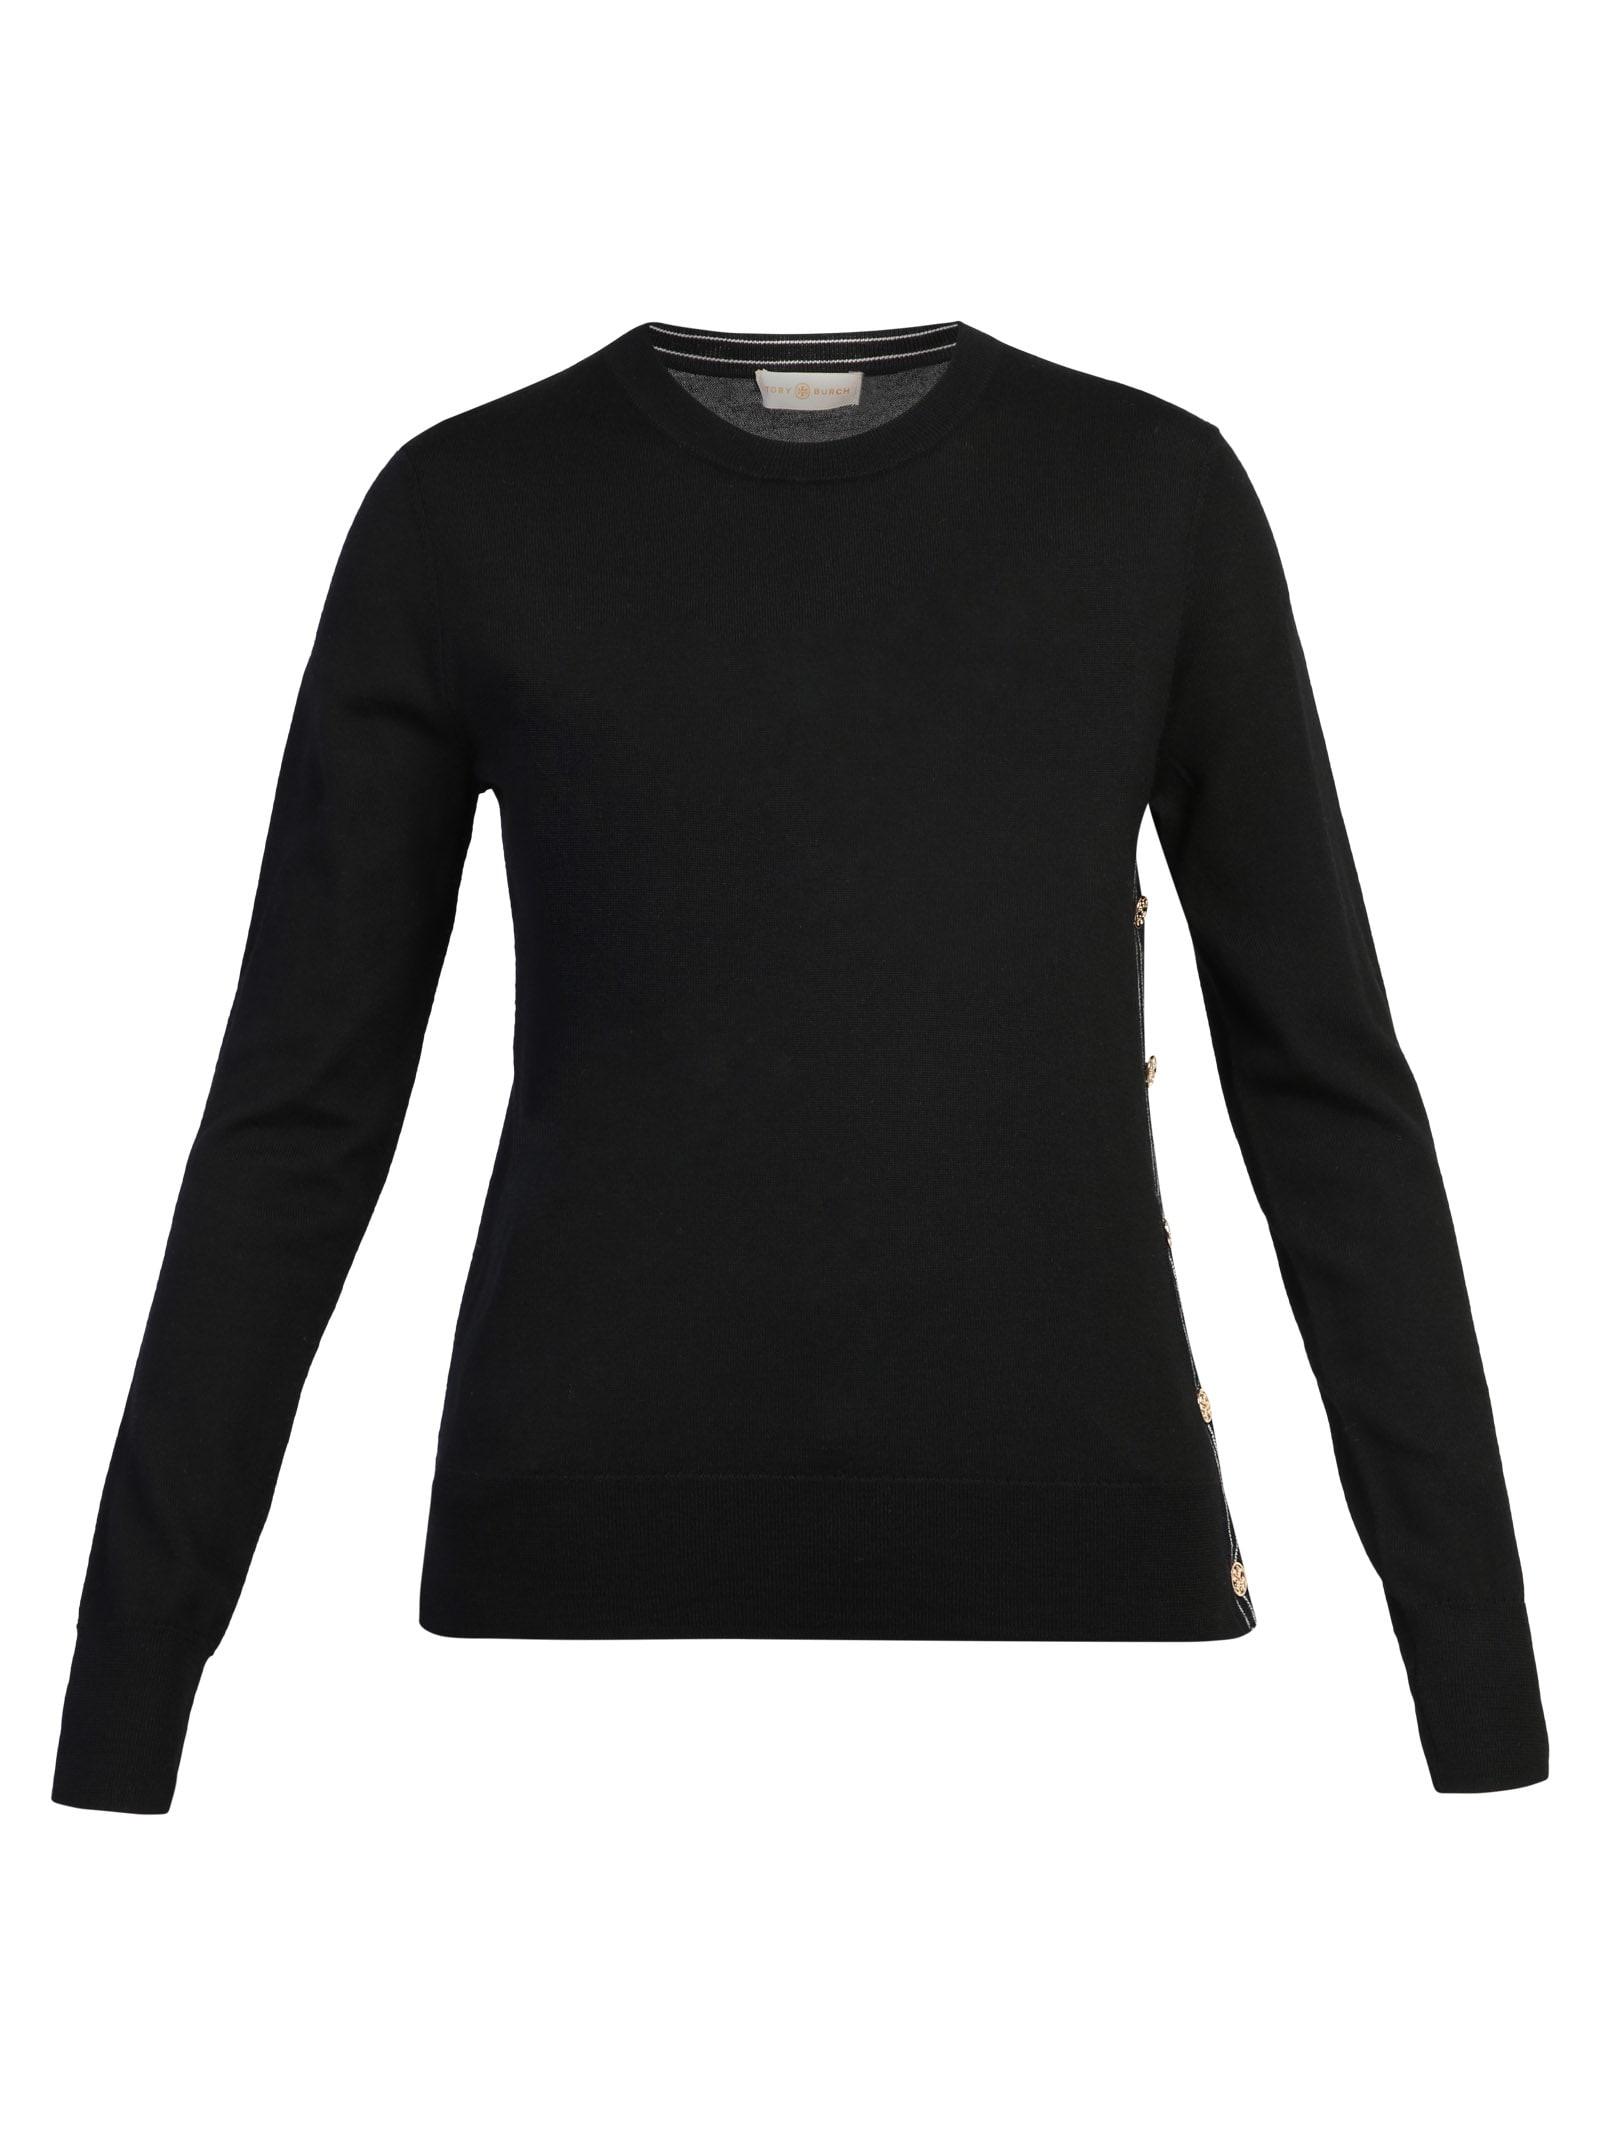 Tory Burch Sweaters BLACK SWEATER